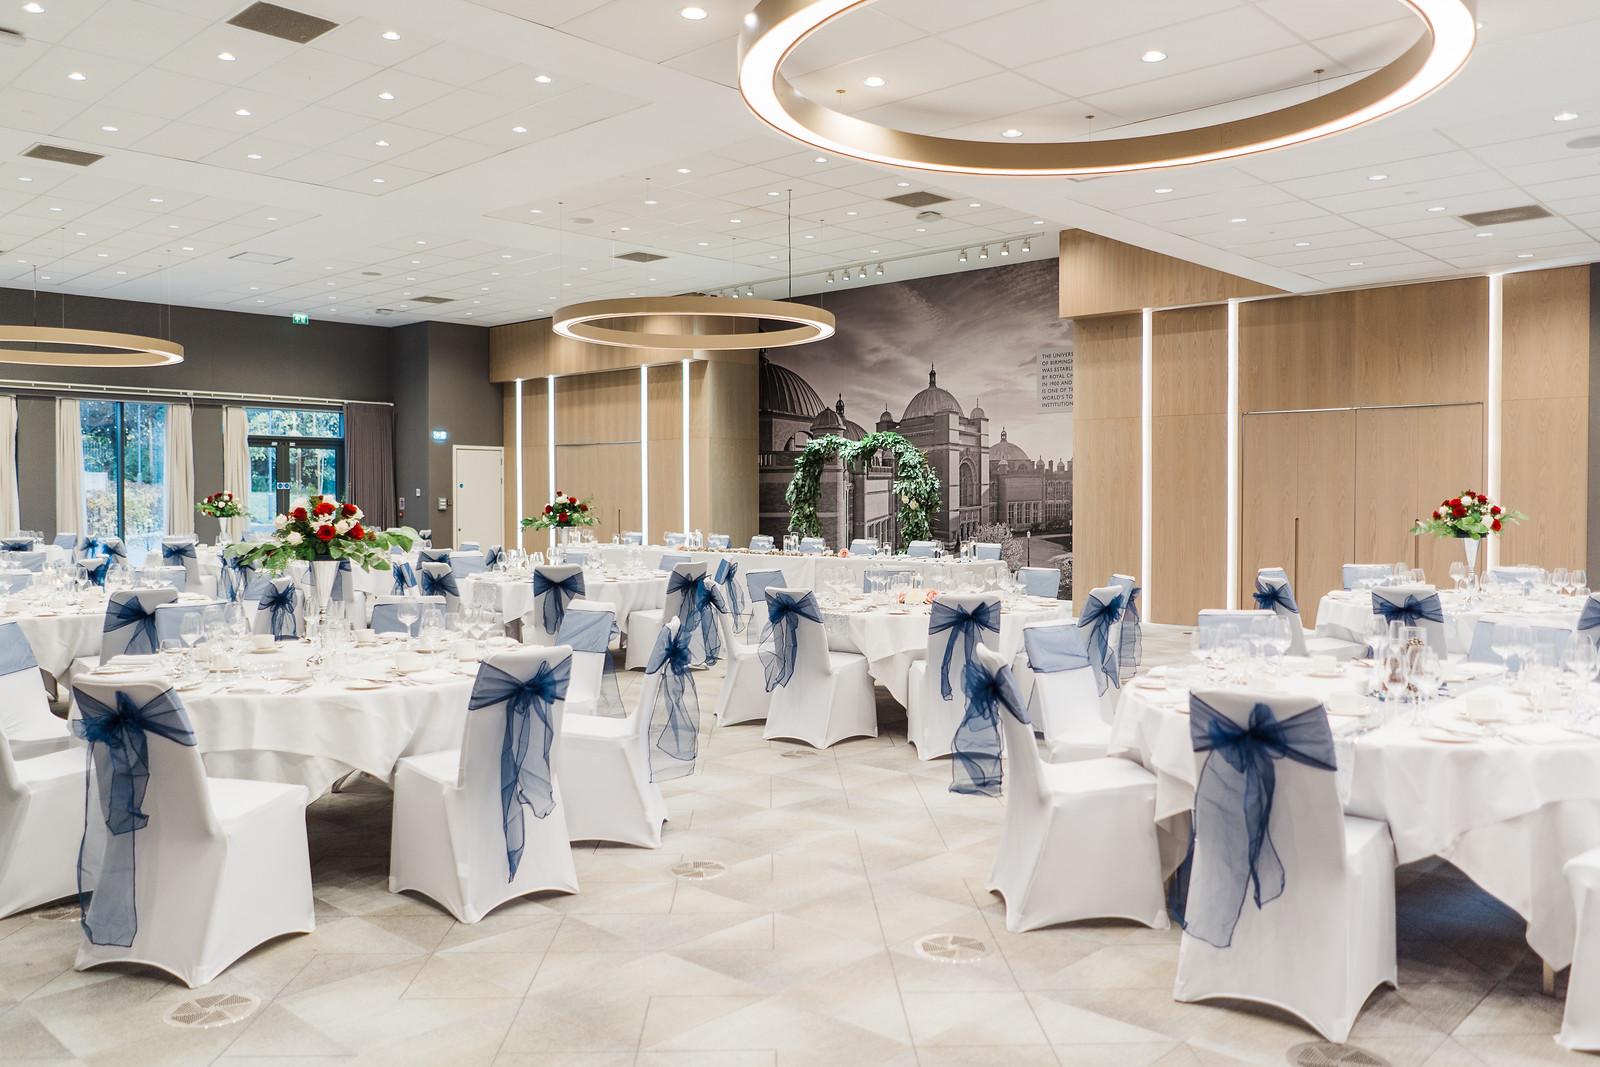 Image of Wedding Reception Edgbaston Park Hotel & Conference Centre, 1718, Member of Historic Hotels Worldwide, in Birmingham, England, Weddings